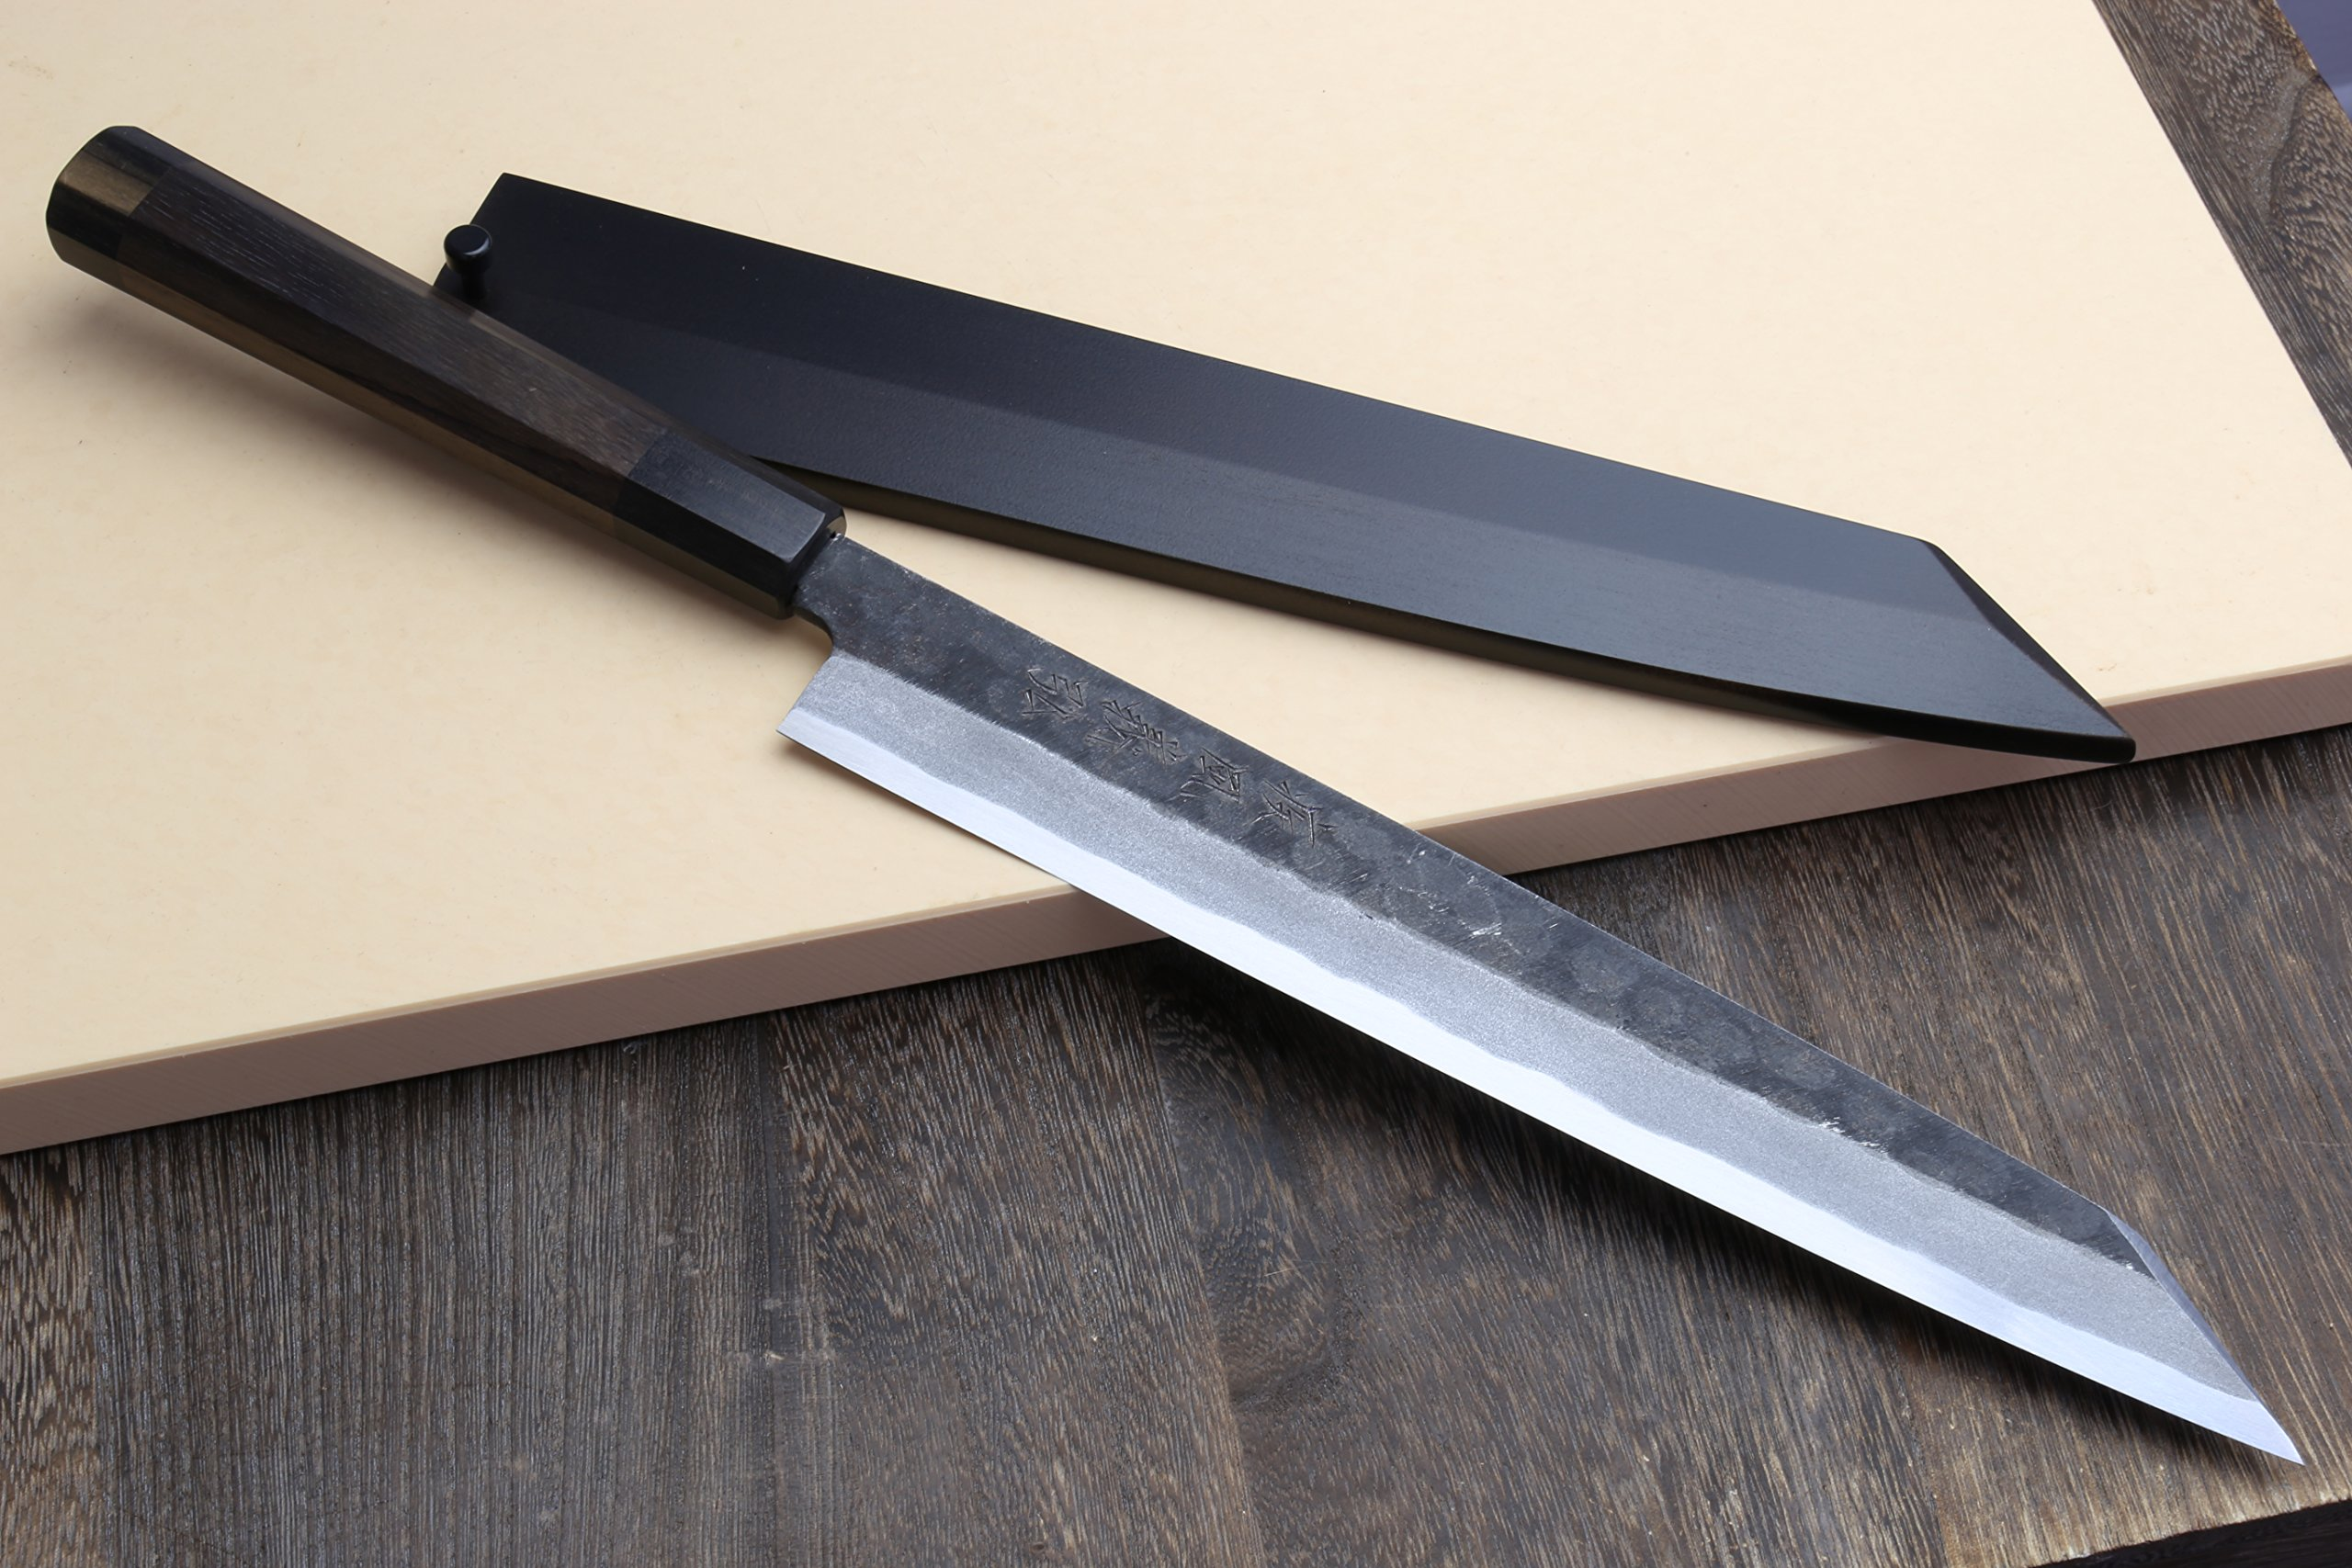 Yoshihiro Hongasumi White Steel Hammered Black Forged Yanagi Kiritsuke Sushi Sashimi Japanese Knife Rosewood Handle with Nuri Saya cover (10.5'' (270mm))